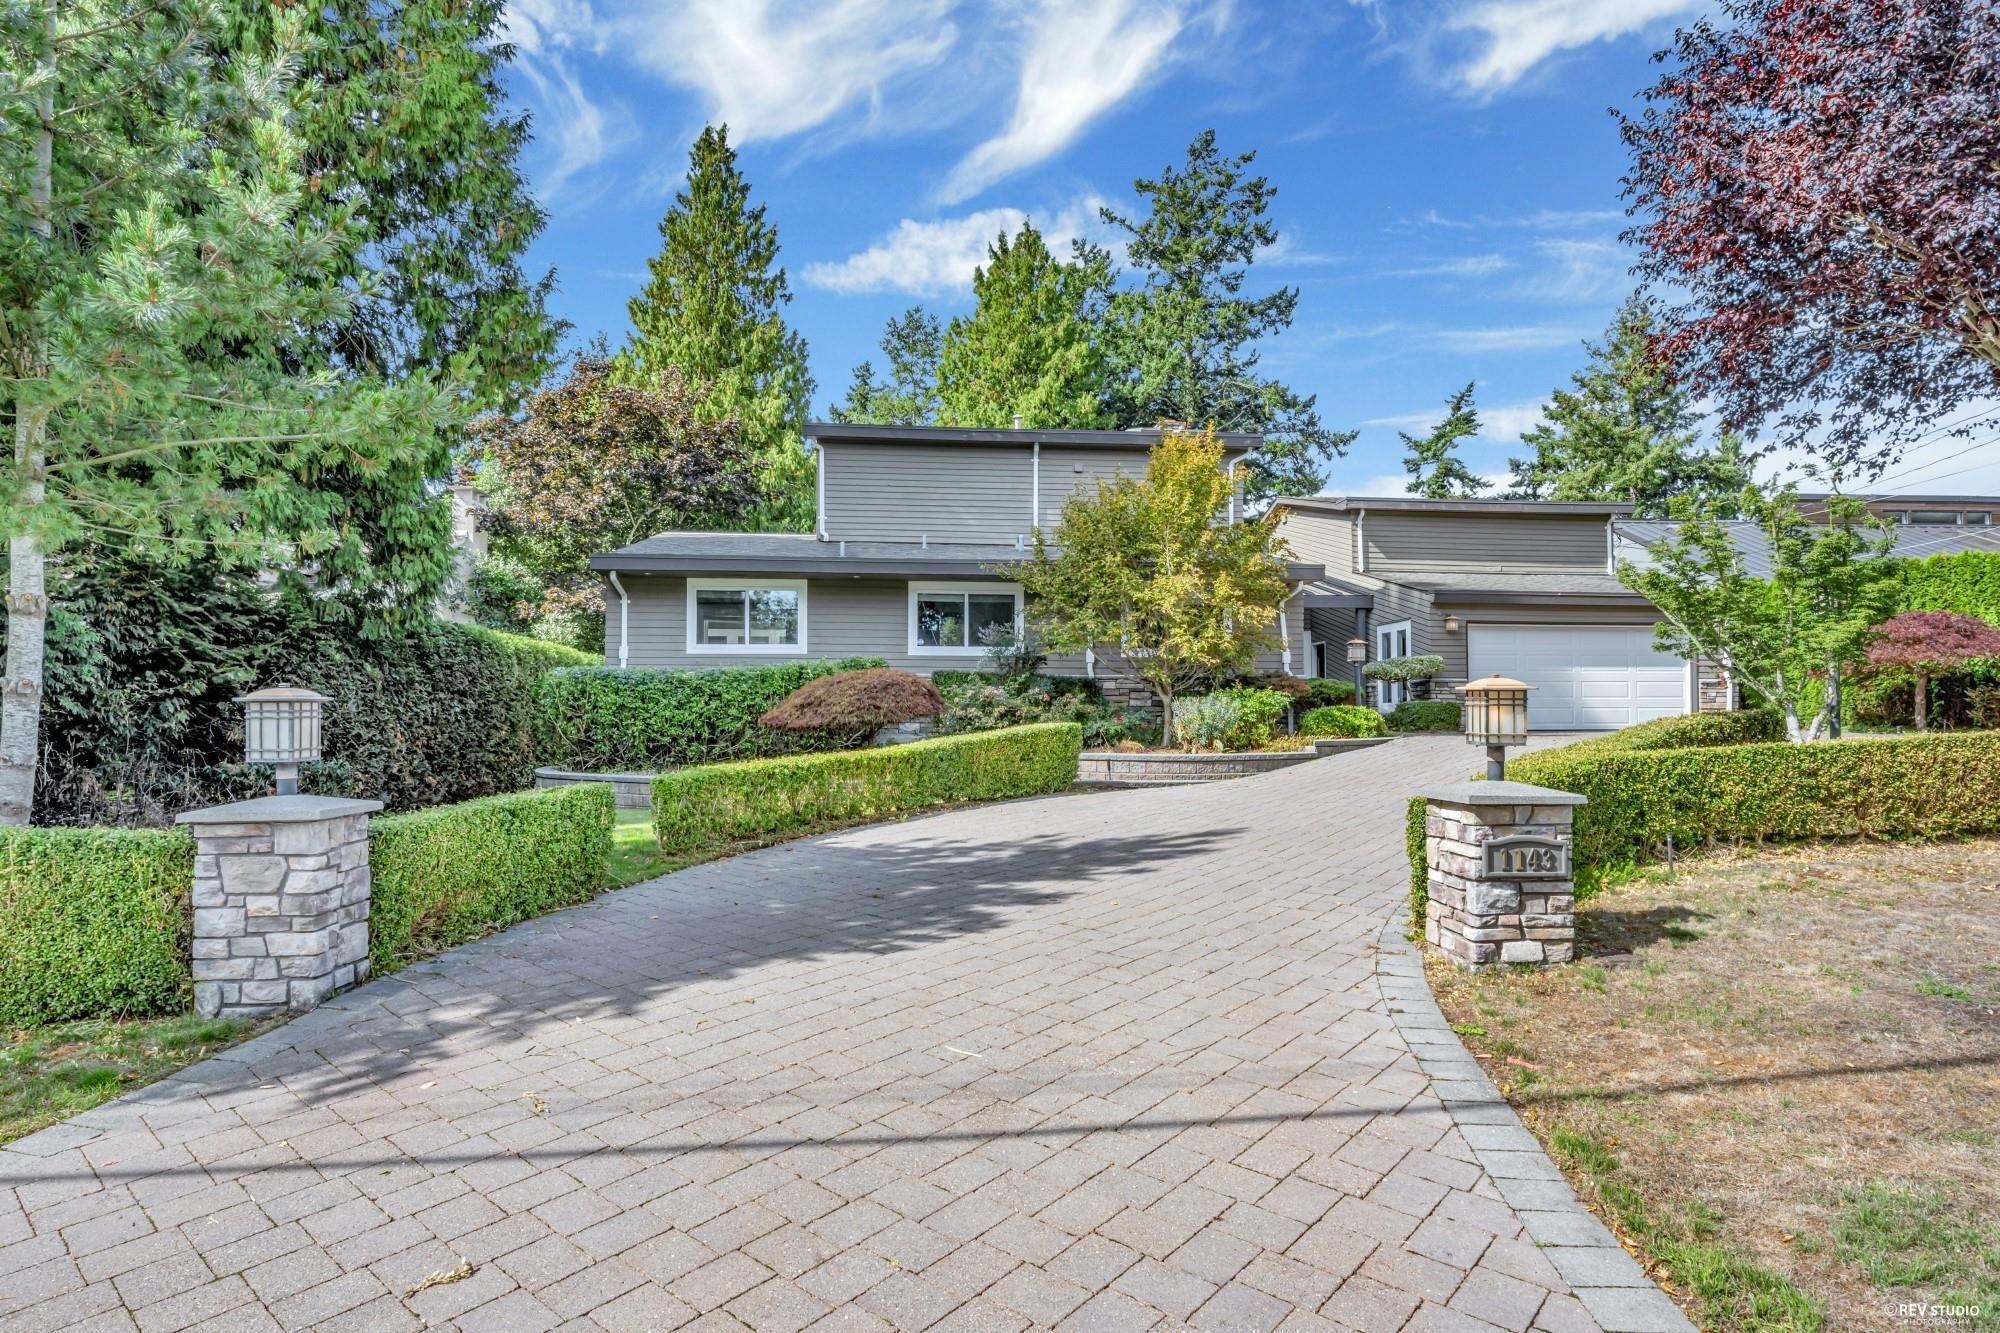 Main Photo: 1143 PACIFIC Drive in Delta: English Bluff House for sale (Tsawwassen)  : MLS®# R2614201